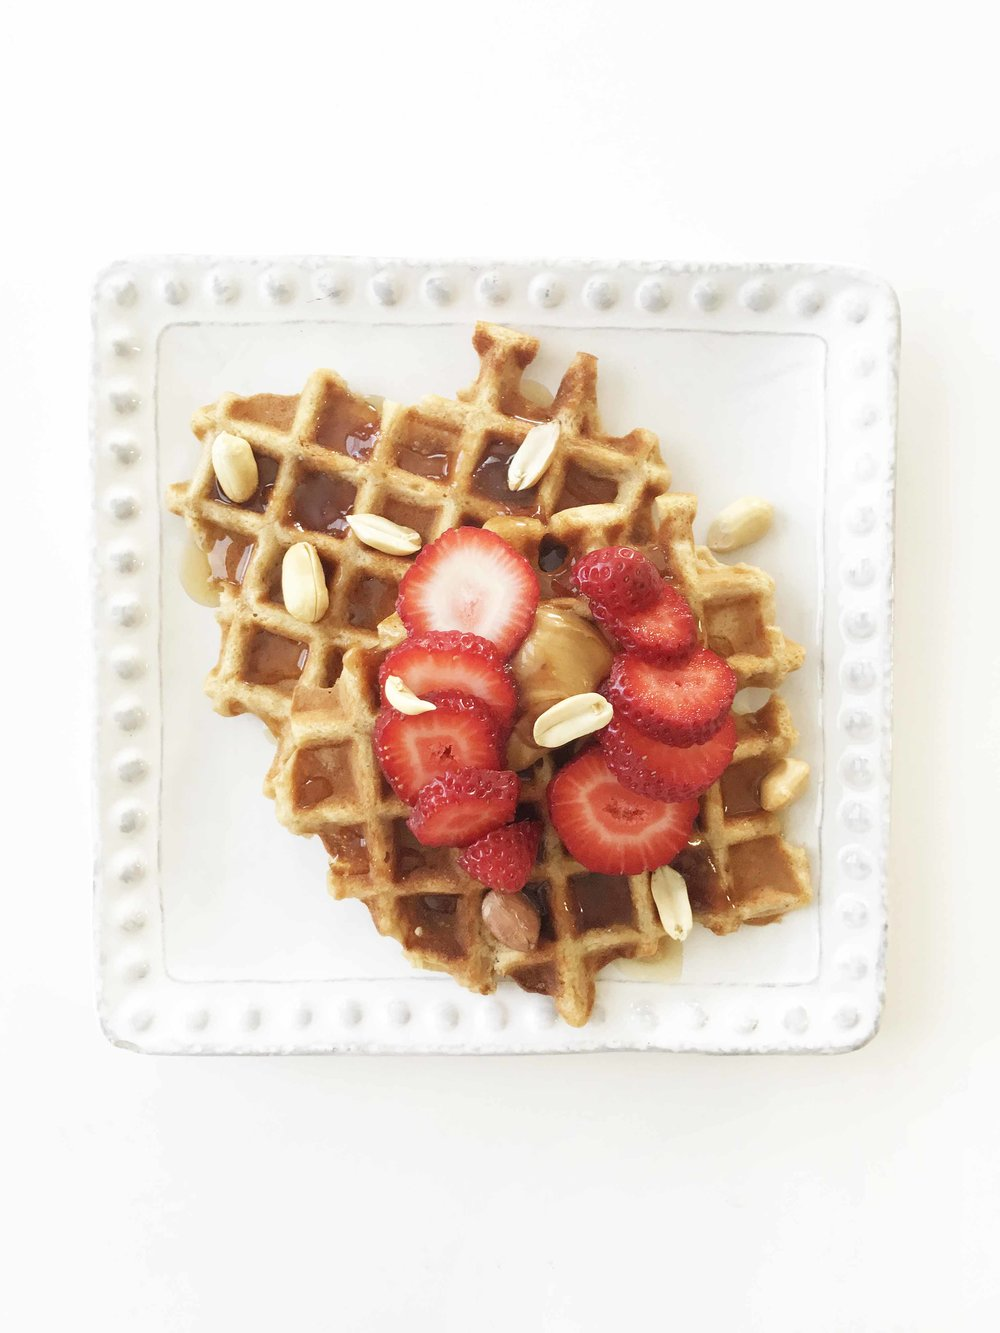 pbj-waffles11.jpg